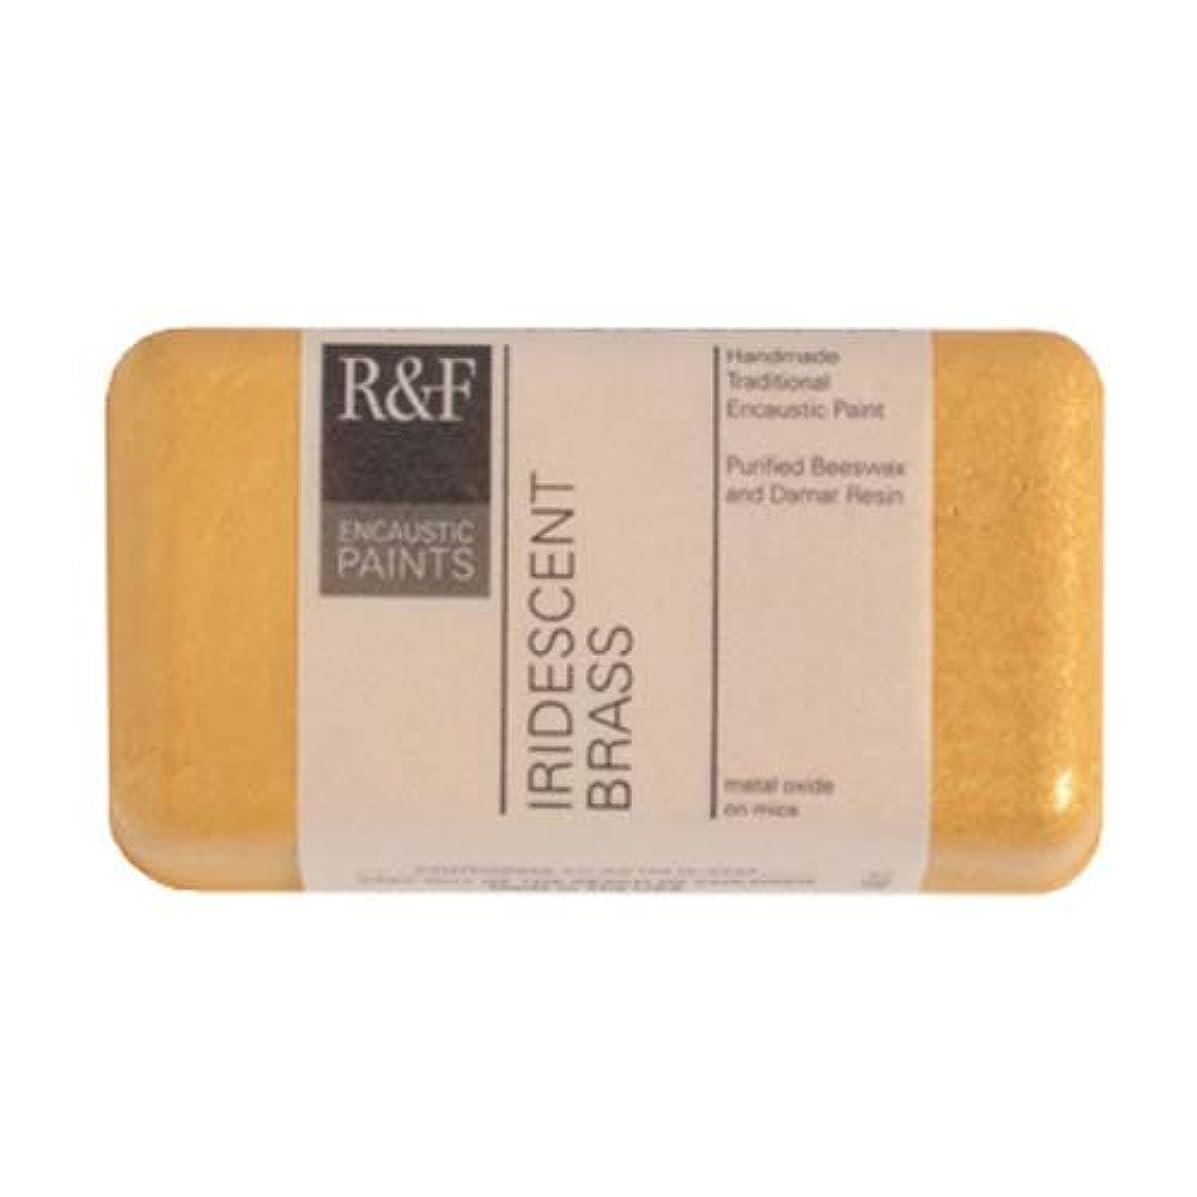 R&F Encaustic 40ml Paint, Iridescent Brass